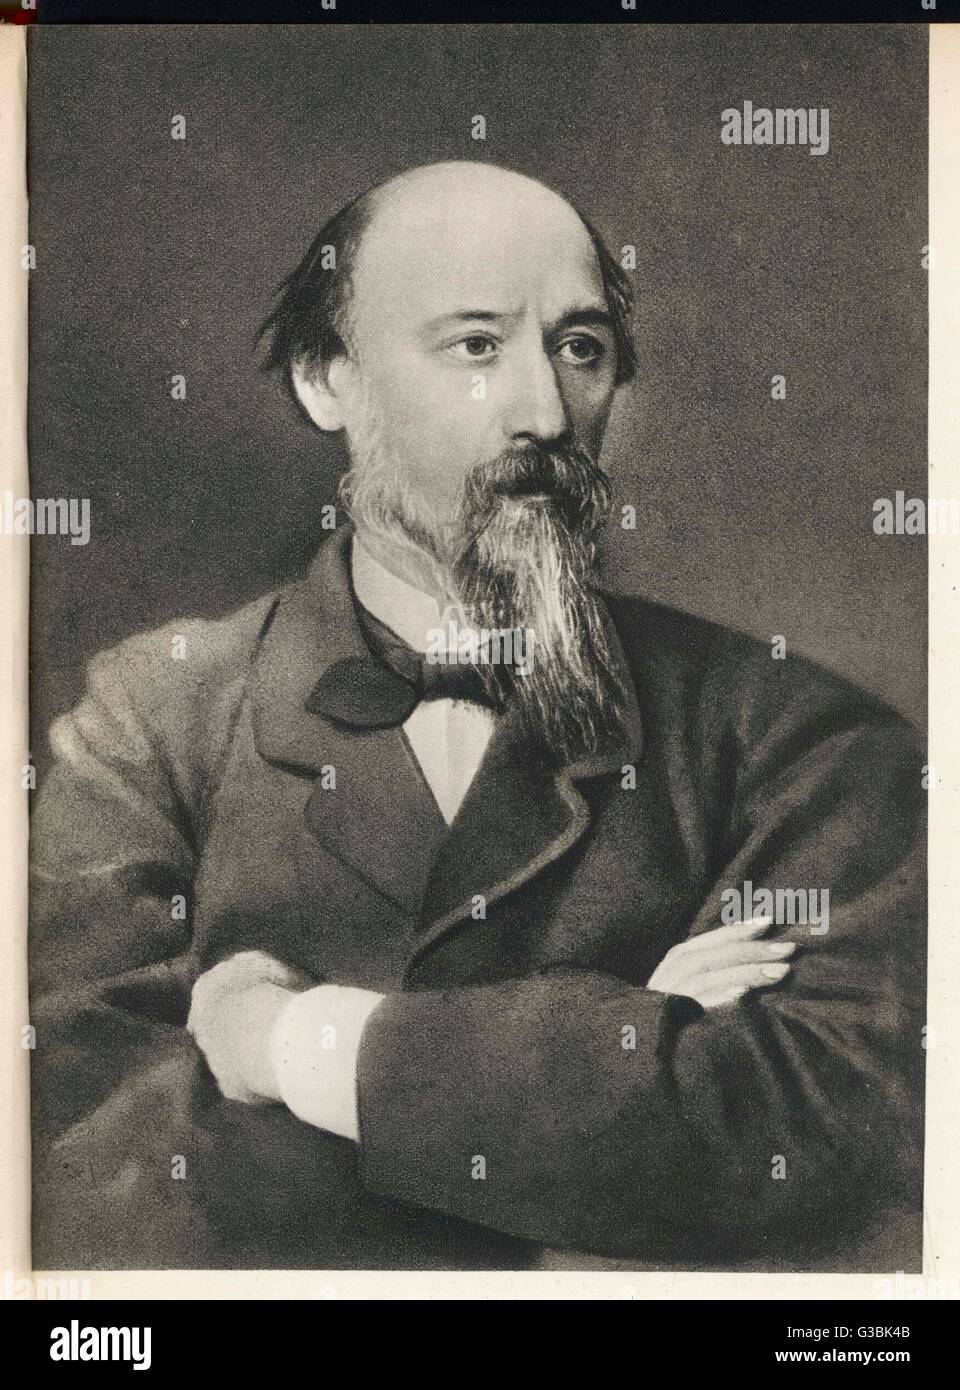 Nikolay Nekrasov: a short biography of the Russian classic